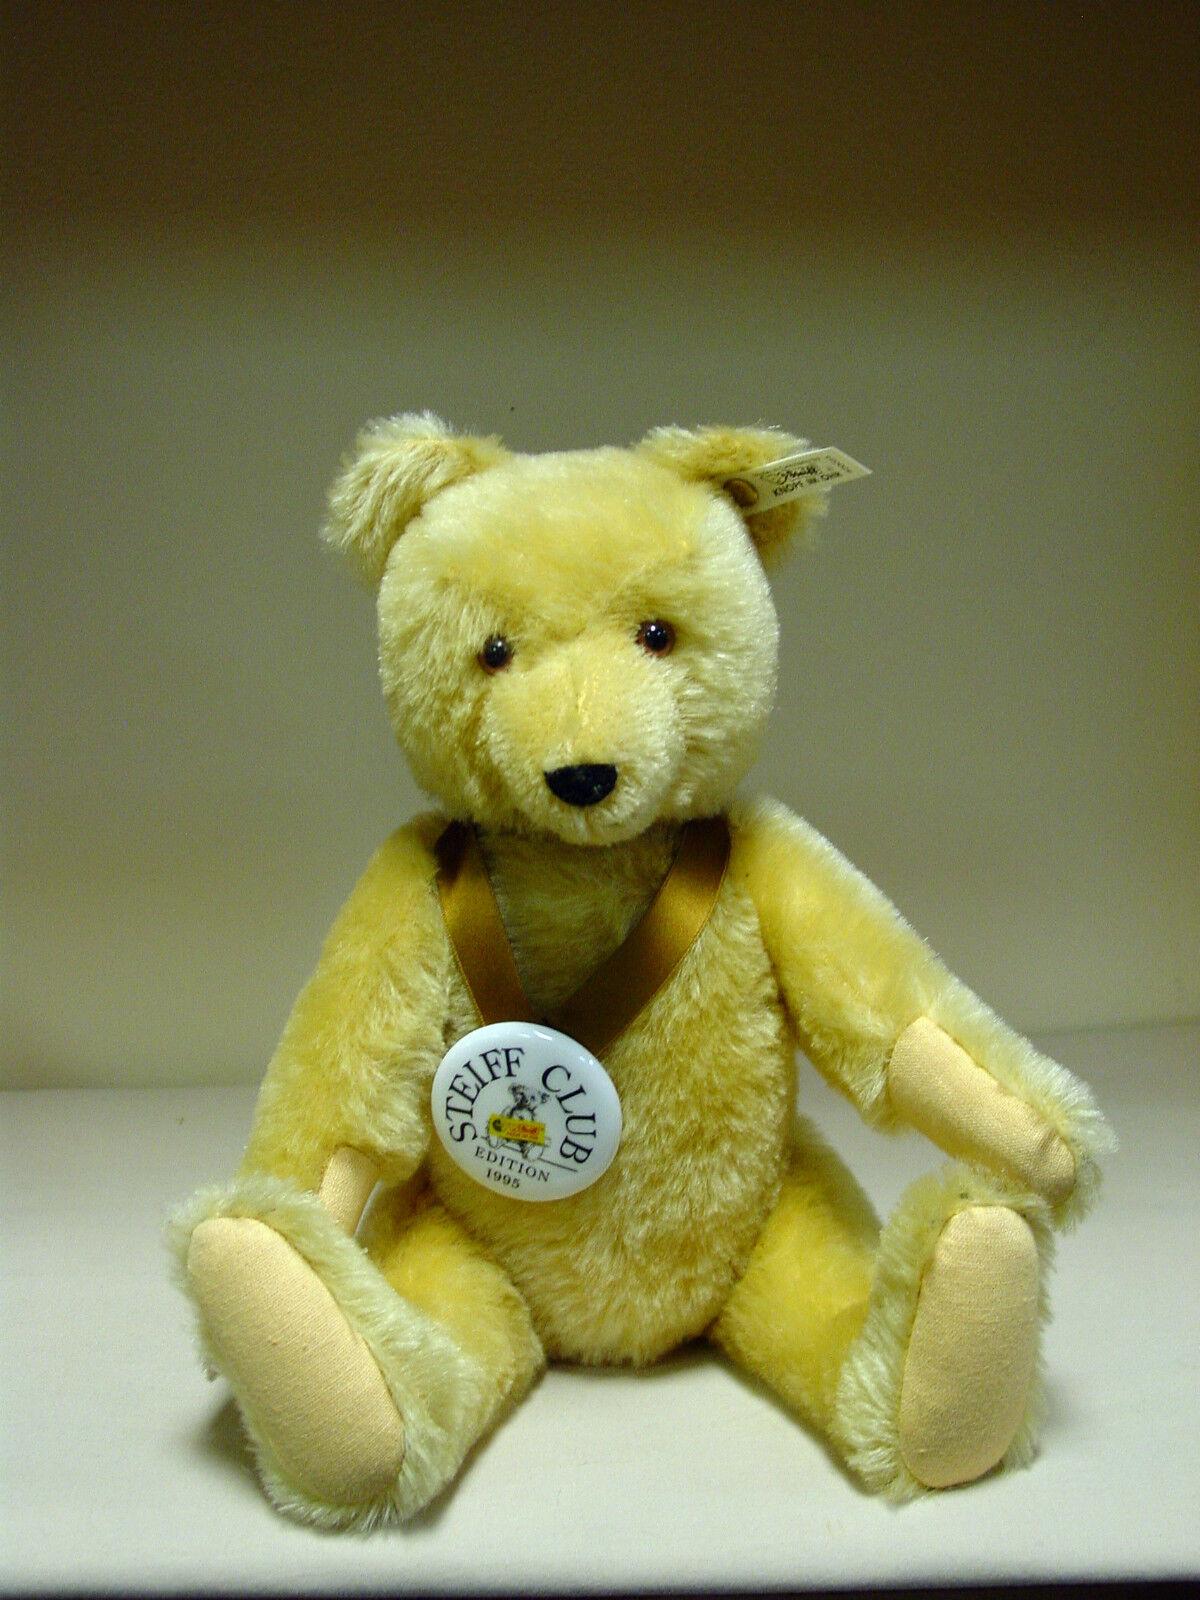 Steiff - 1995 Steiff Club Bear - Baby Bear - Replica 1946 -  420054